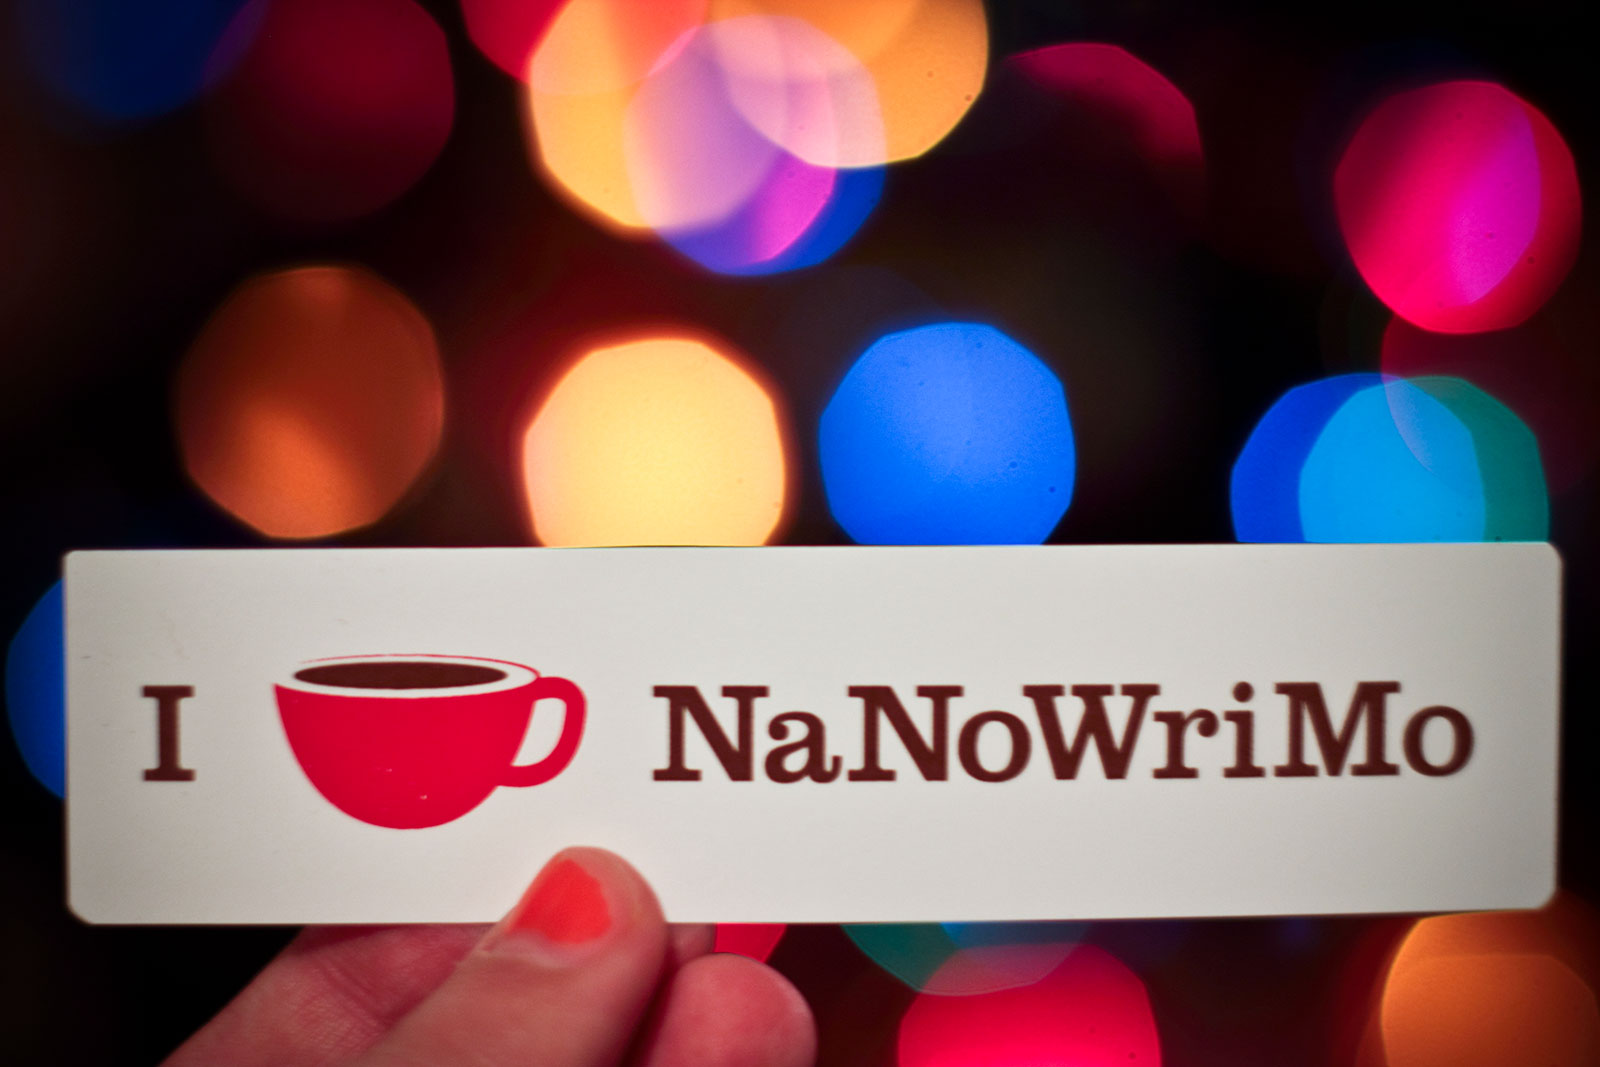 I coffee NaNoWriMo